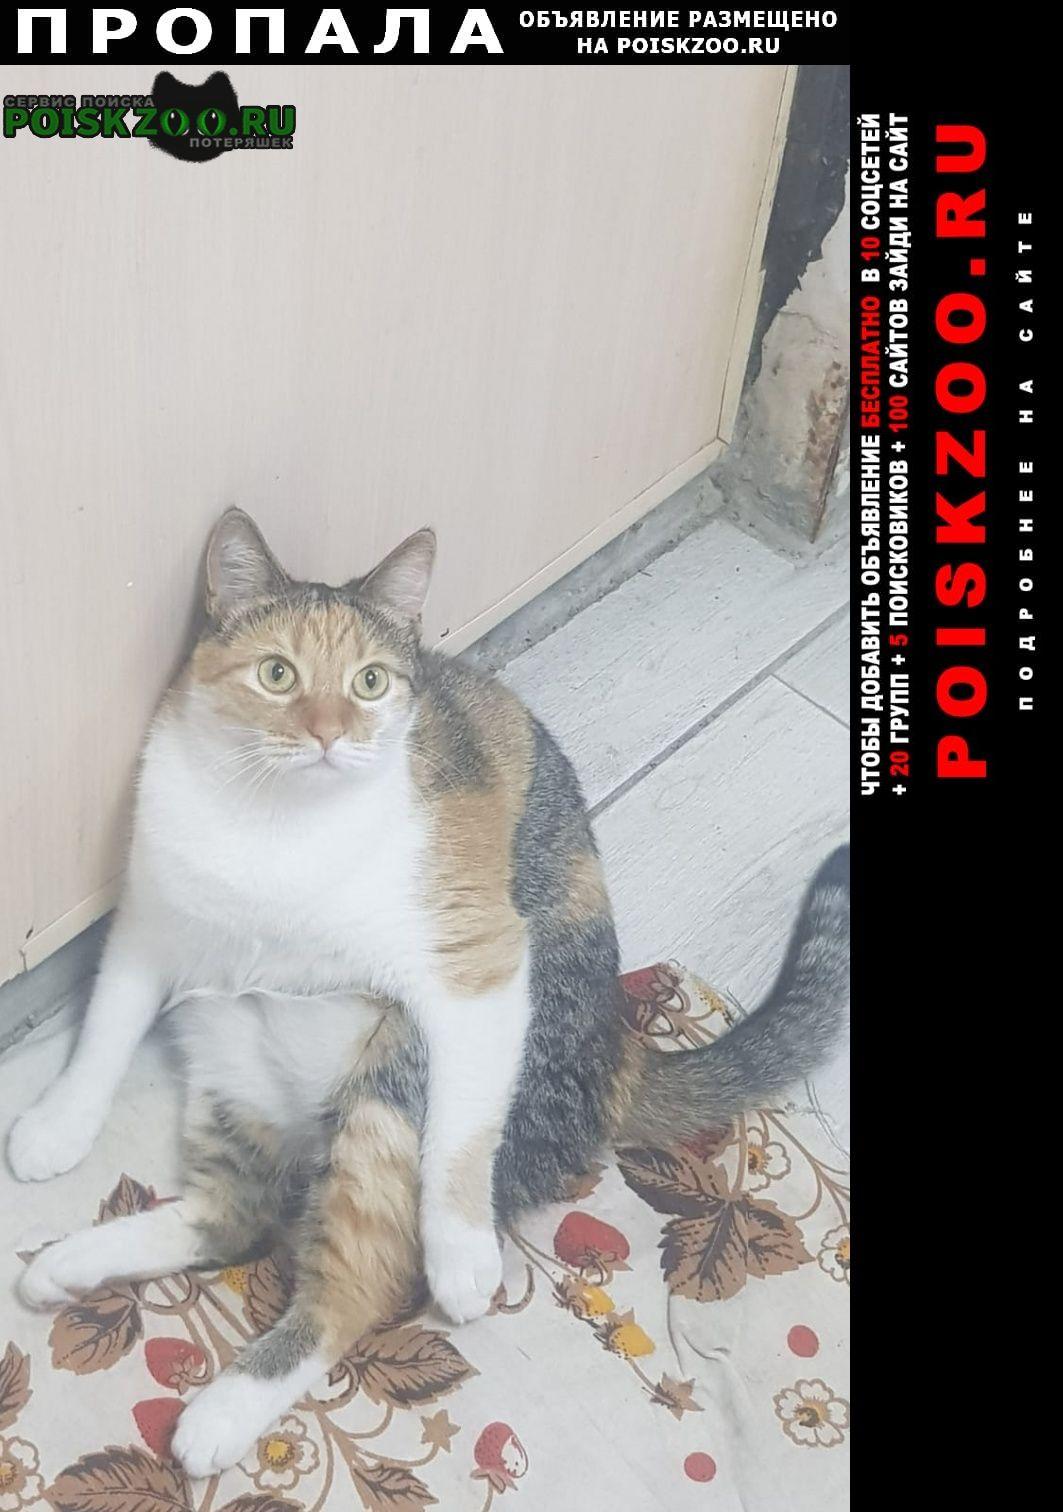 Ростов-на-Дону Пропала кошка. районе 43 линии